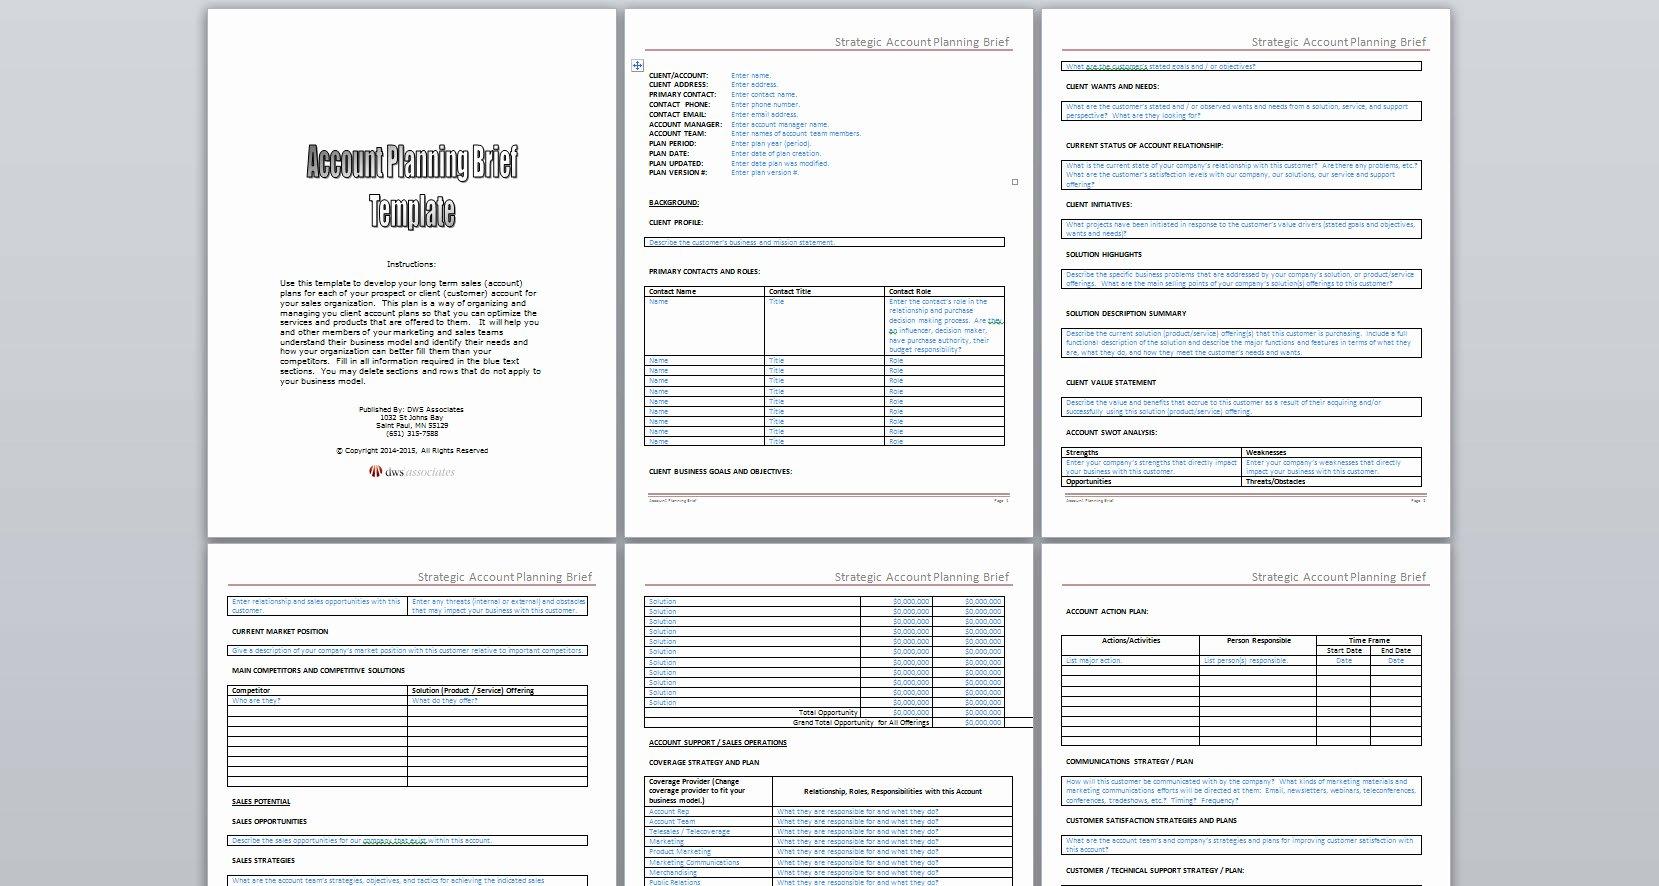 Strategic Account Plan Template Fresh Dws associates Strategic Account Planning Brief Template